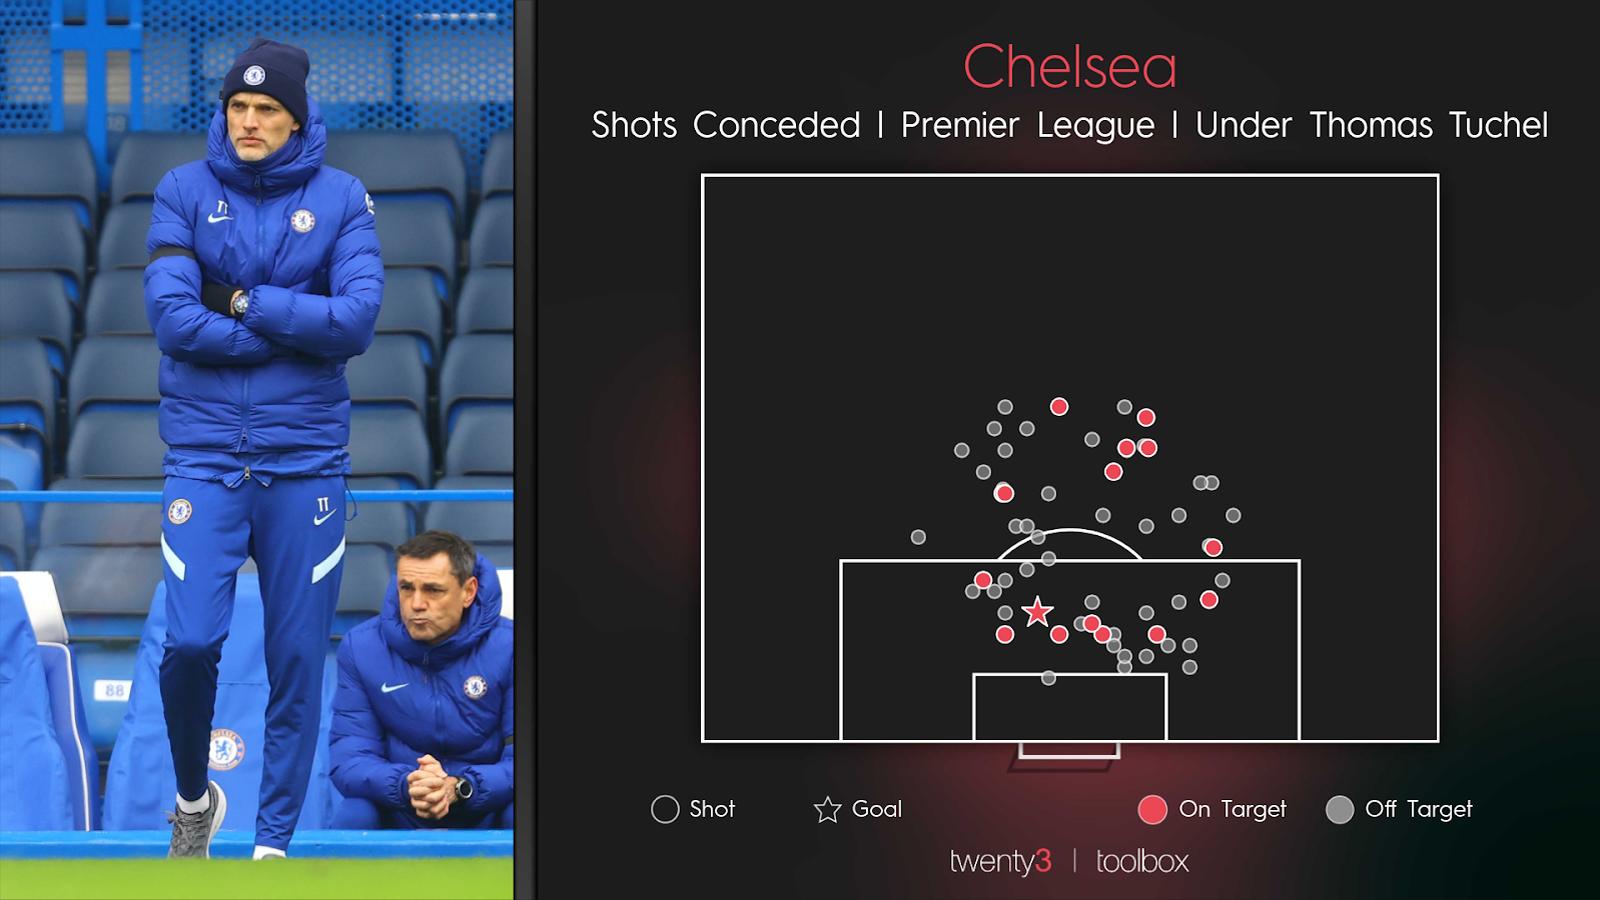 Chelsea's shots conceded map in the Premier League under Thomas Tuchel.